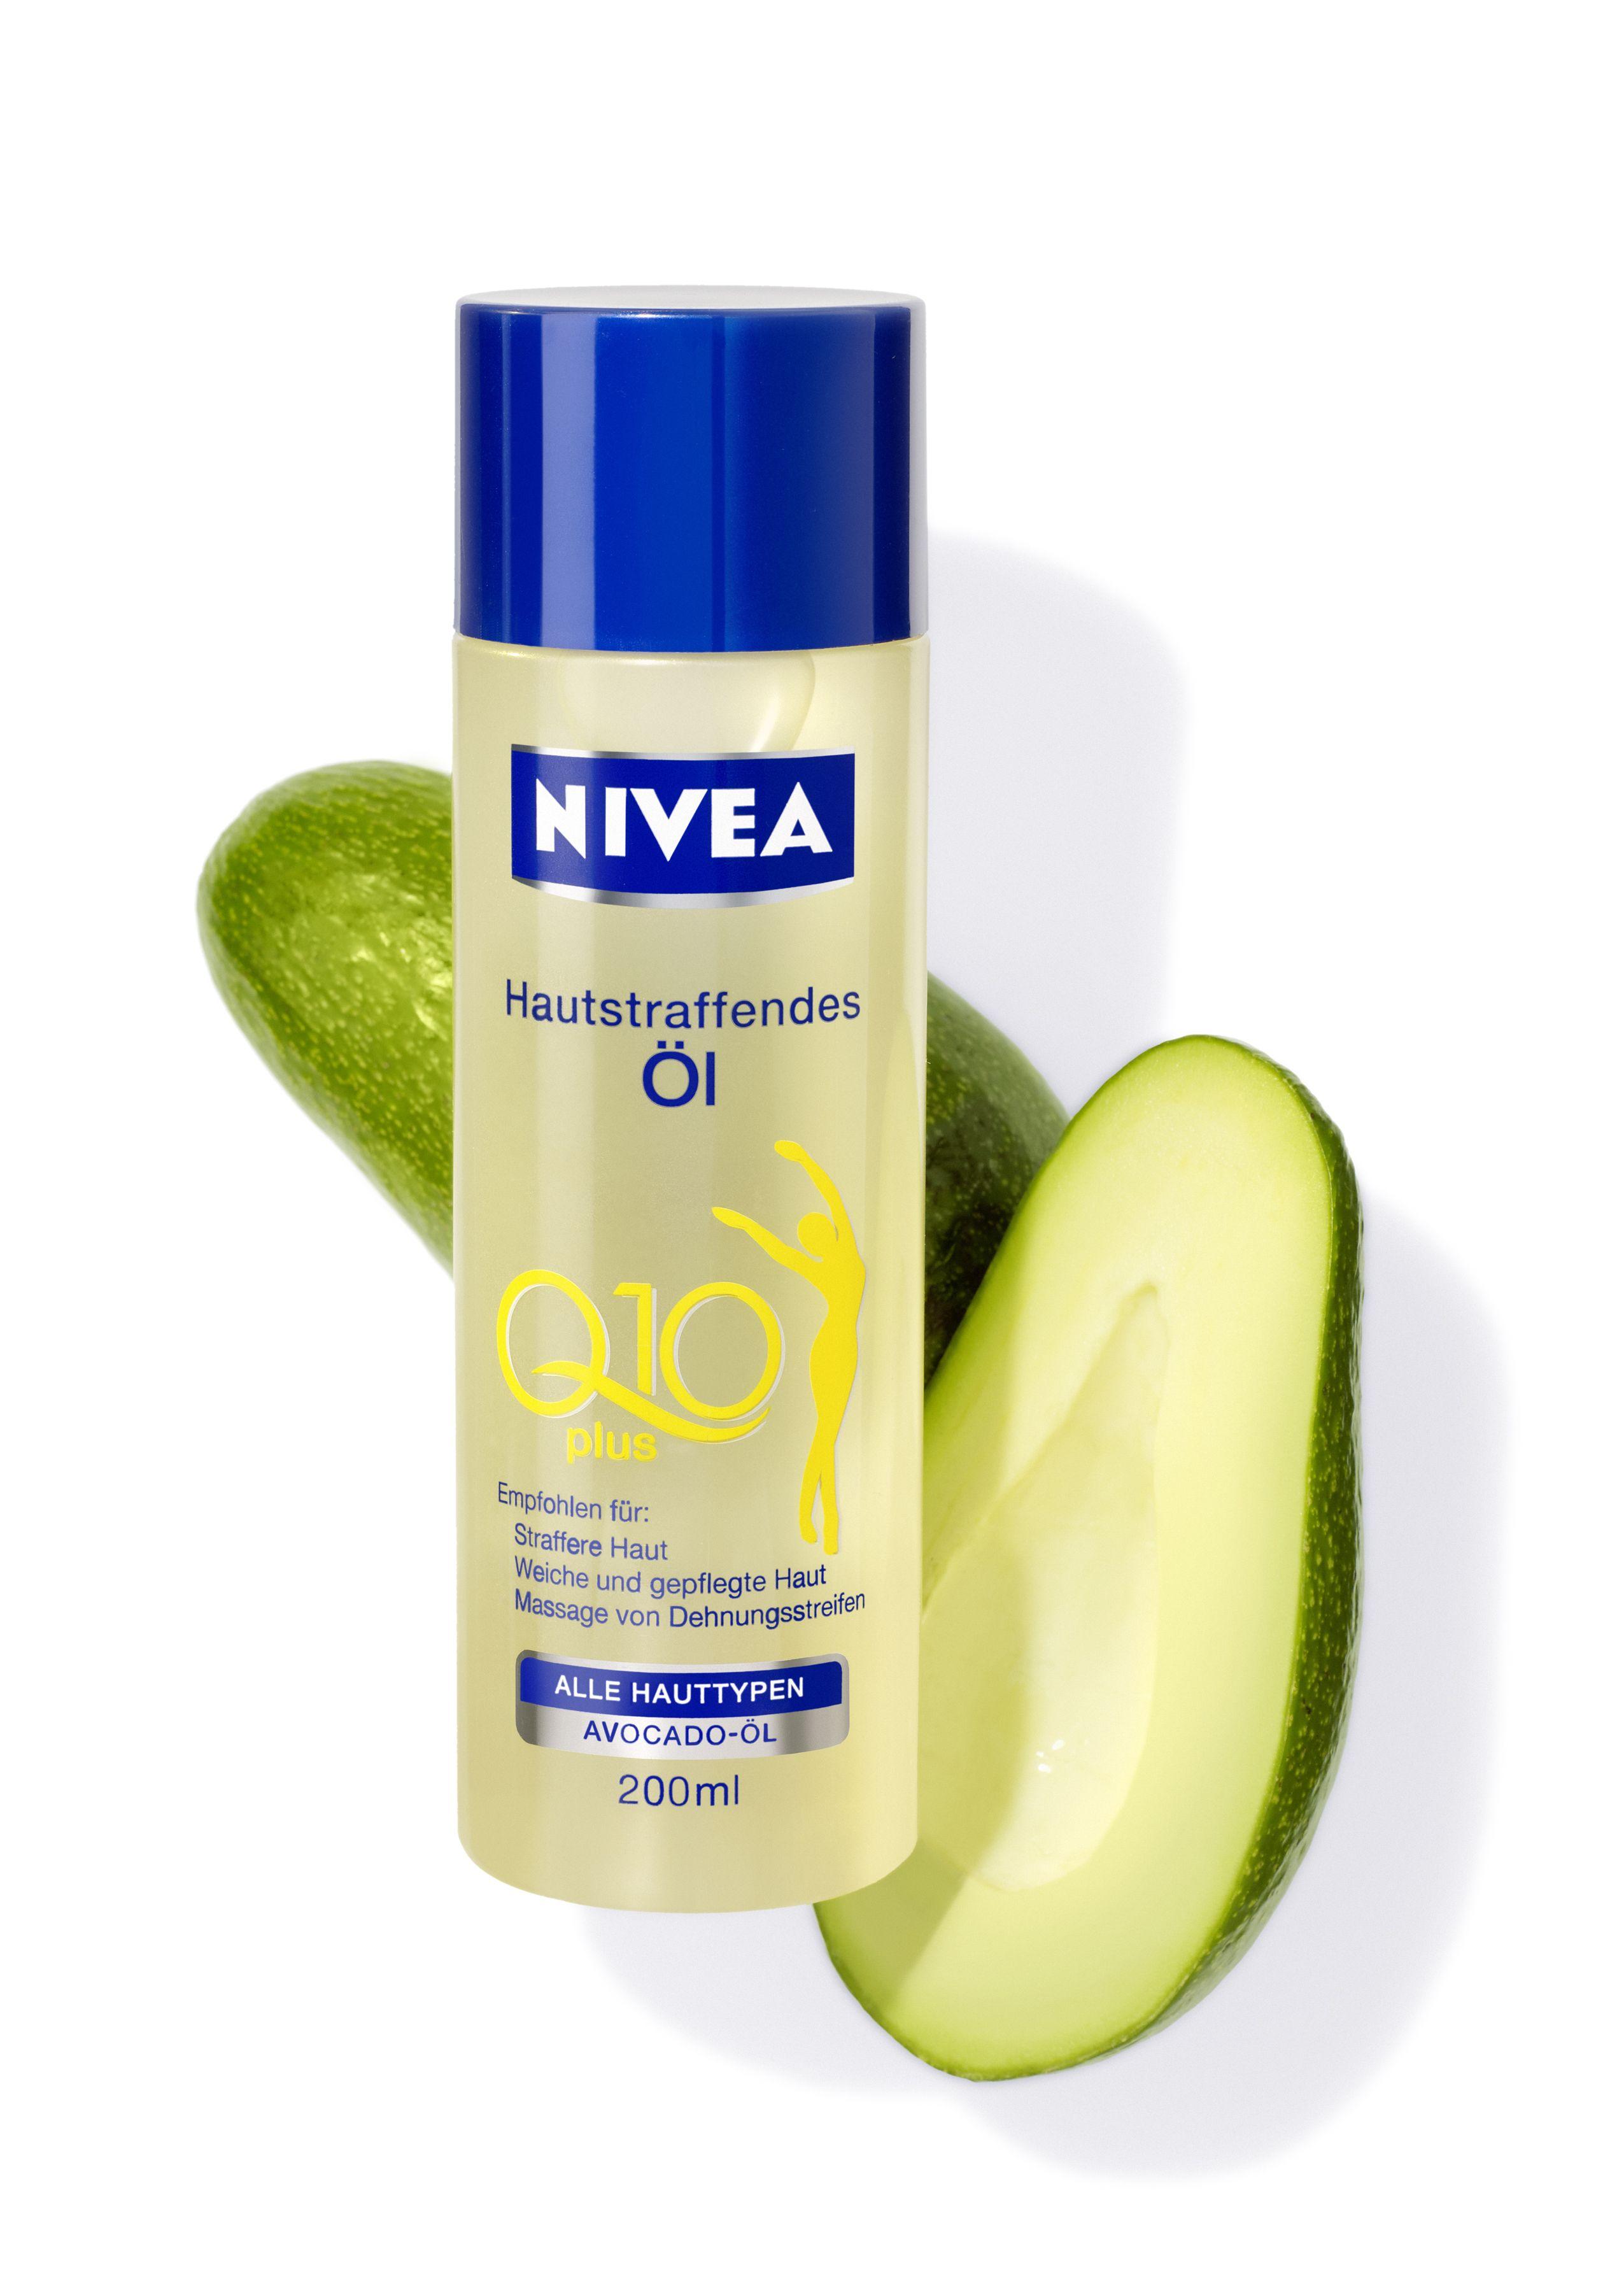 NIVEA Hautstraffendes Öl Q10 Plus. Erhältlich im NIVEA